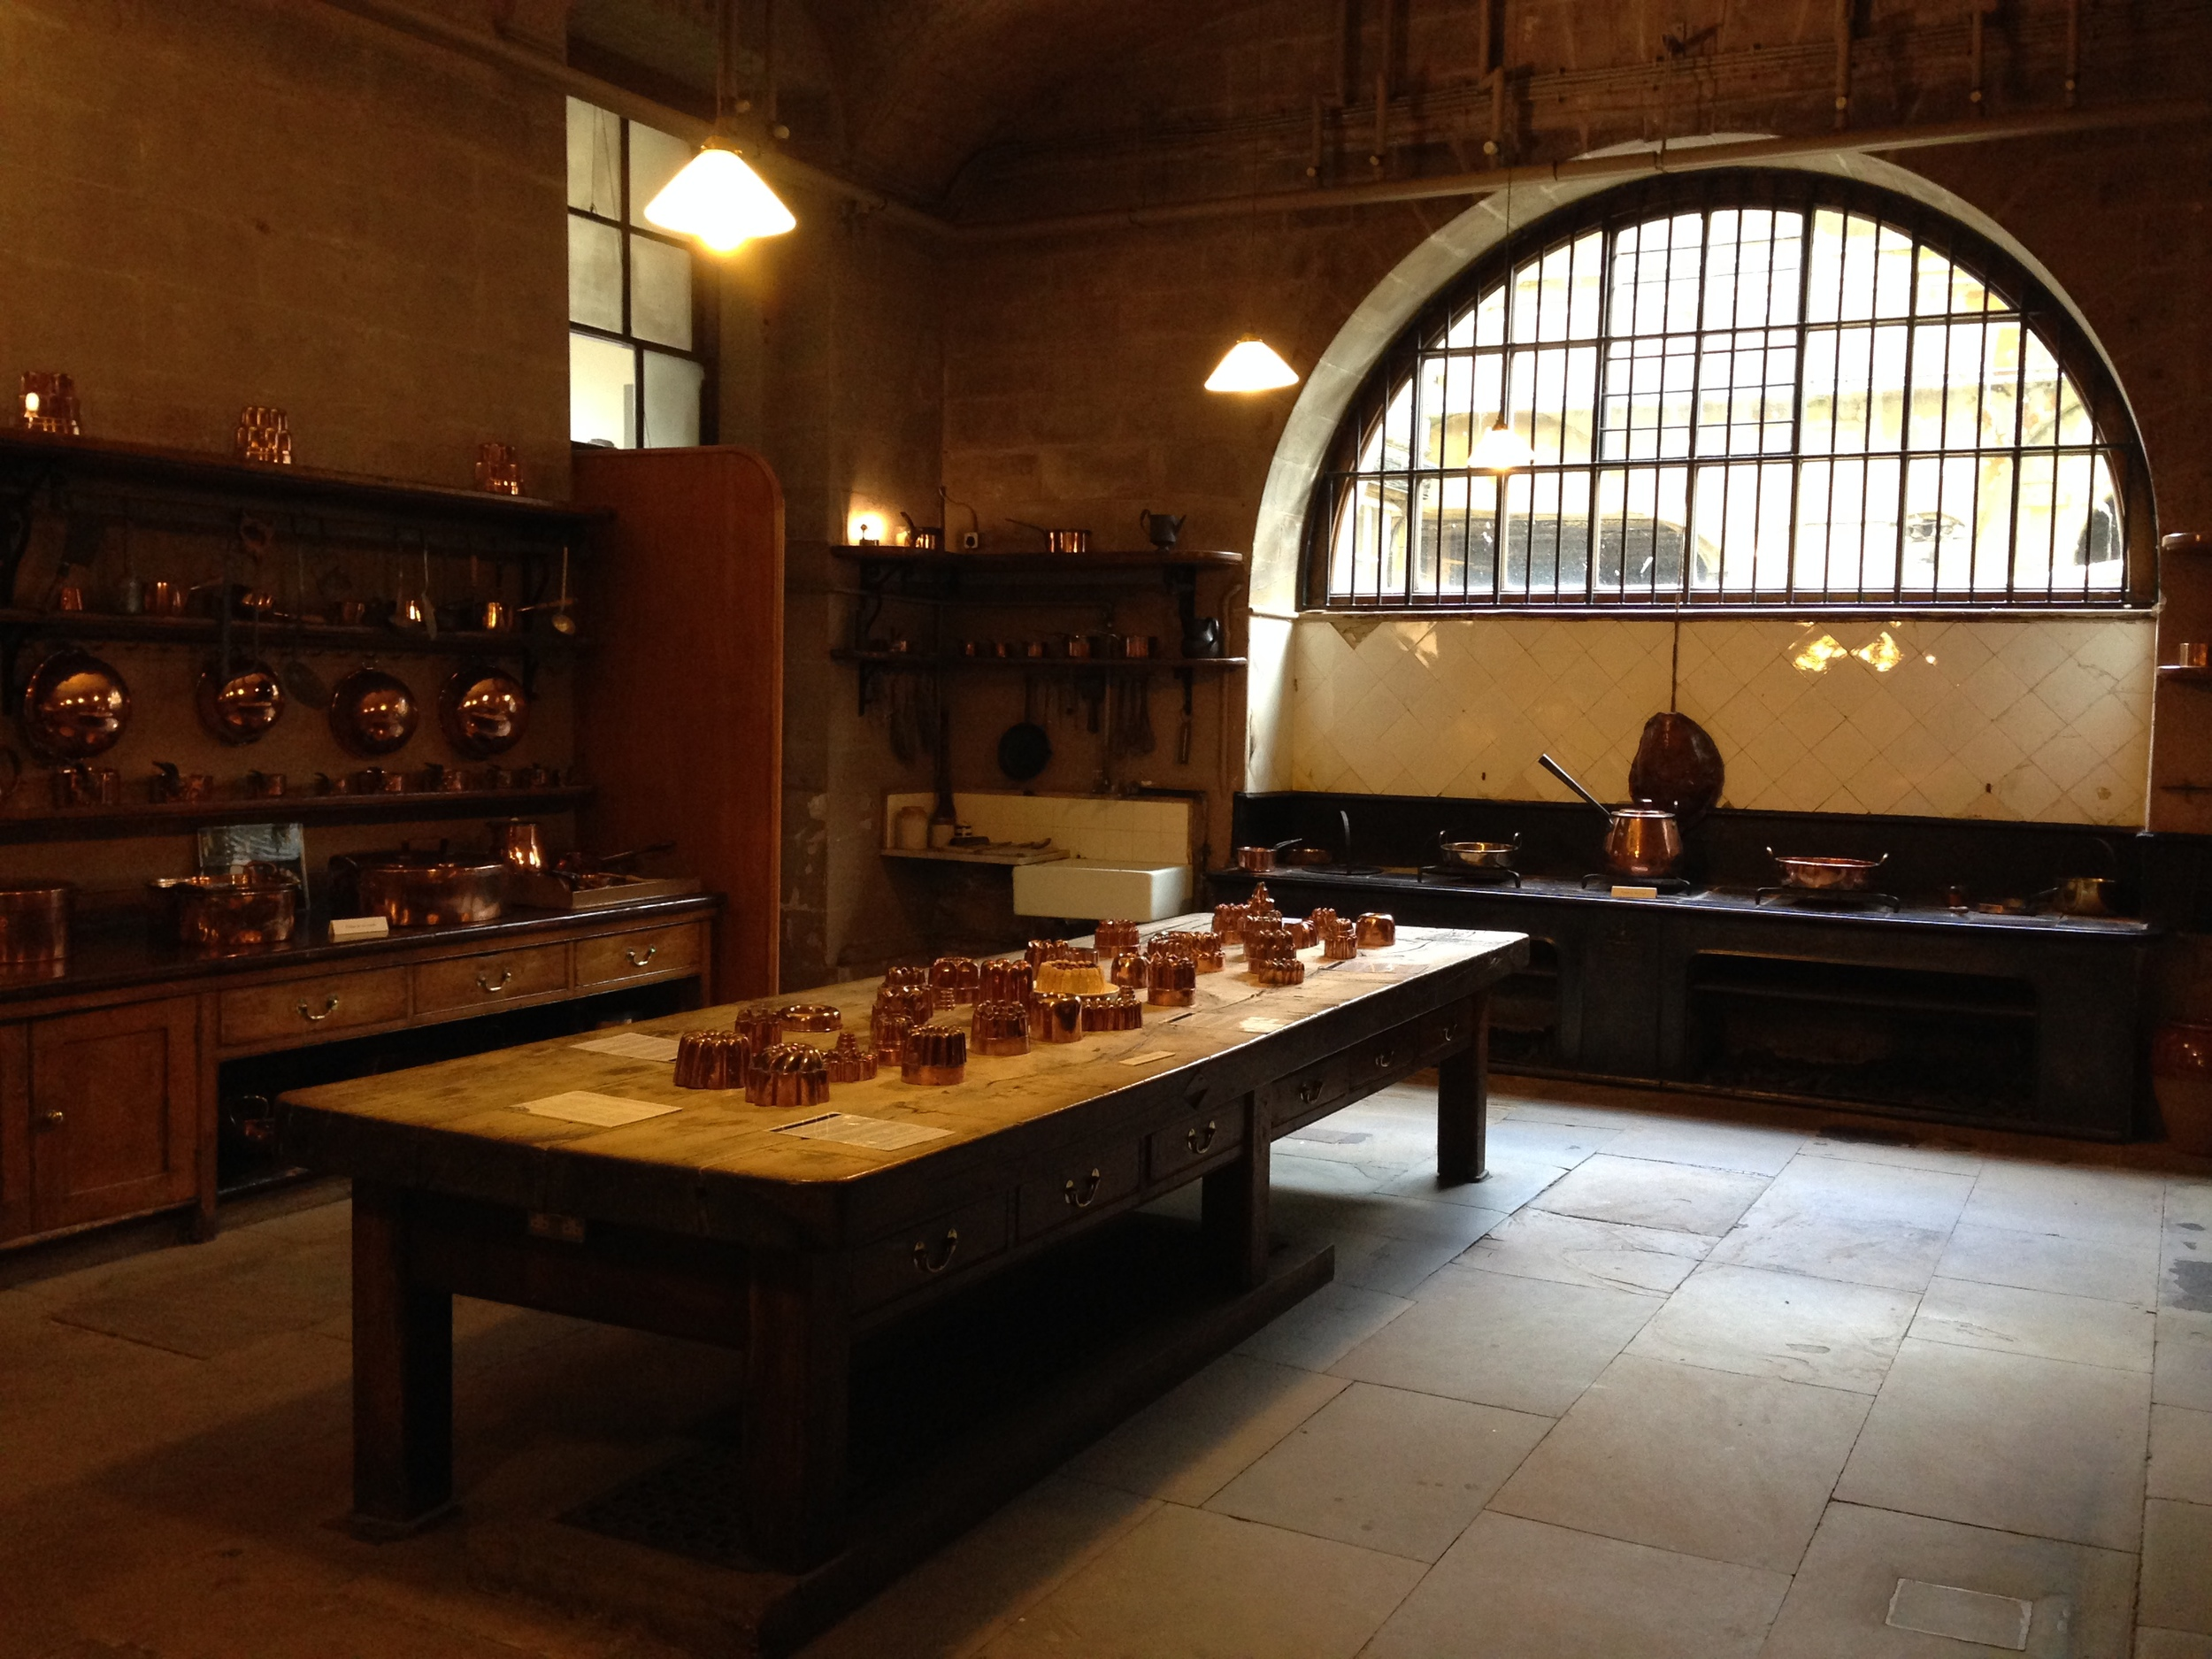 Downton Abbey Schmownton Abbey. Harewood House's kitchen has it beat.